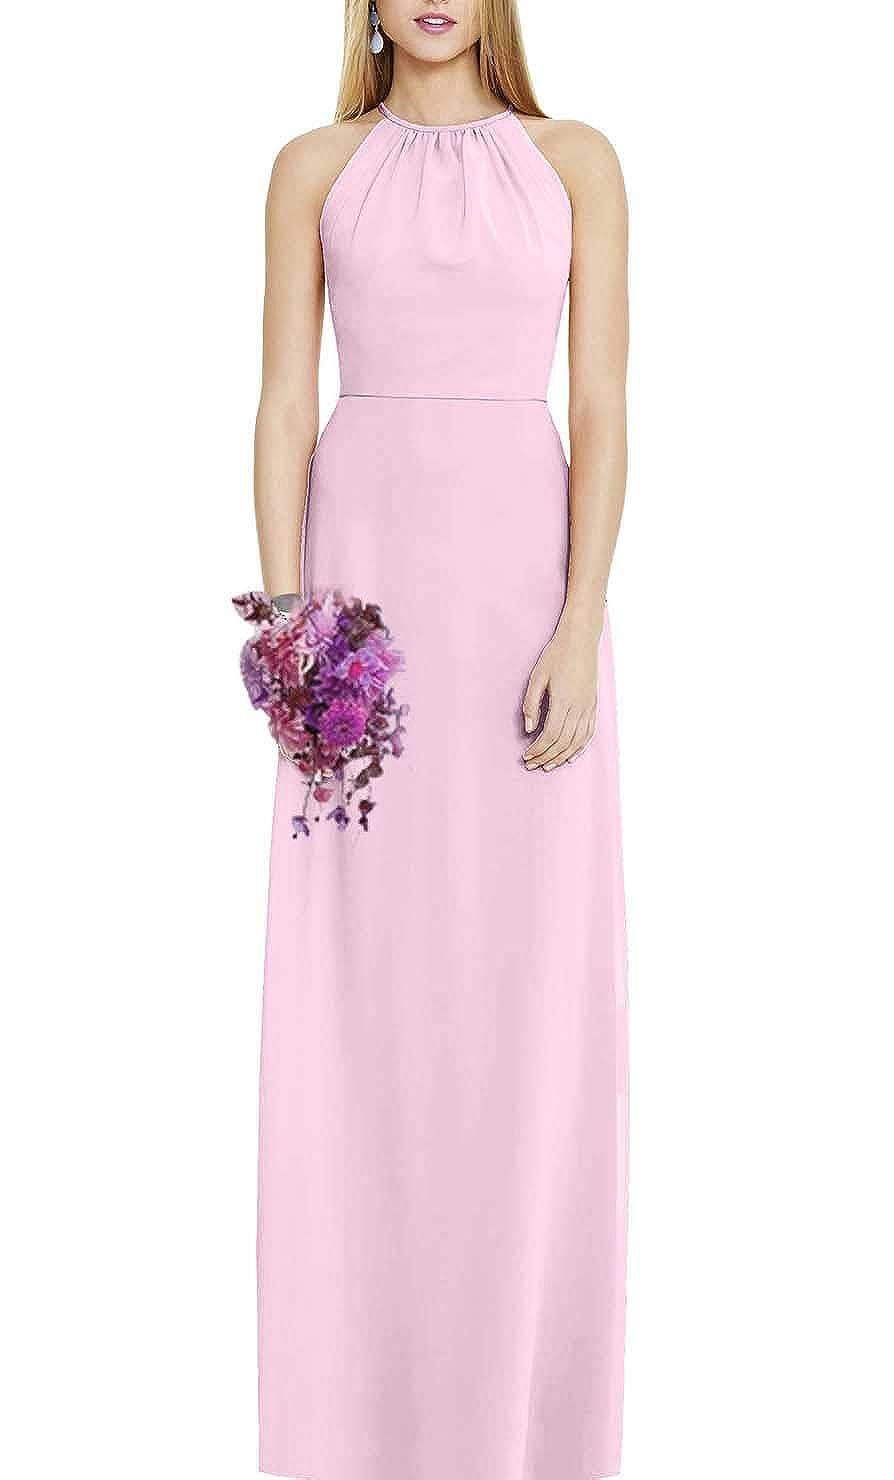 Baby Pink FeiYueXinXing Women's Halter Neck ALine Prom Ball Gowns Long Evening Bridesmaid Guest Dresses